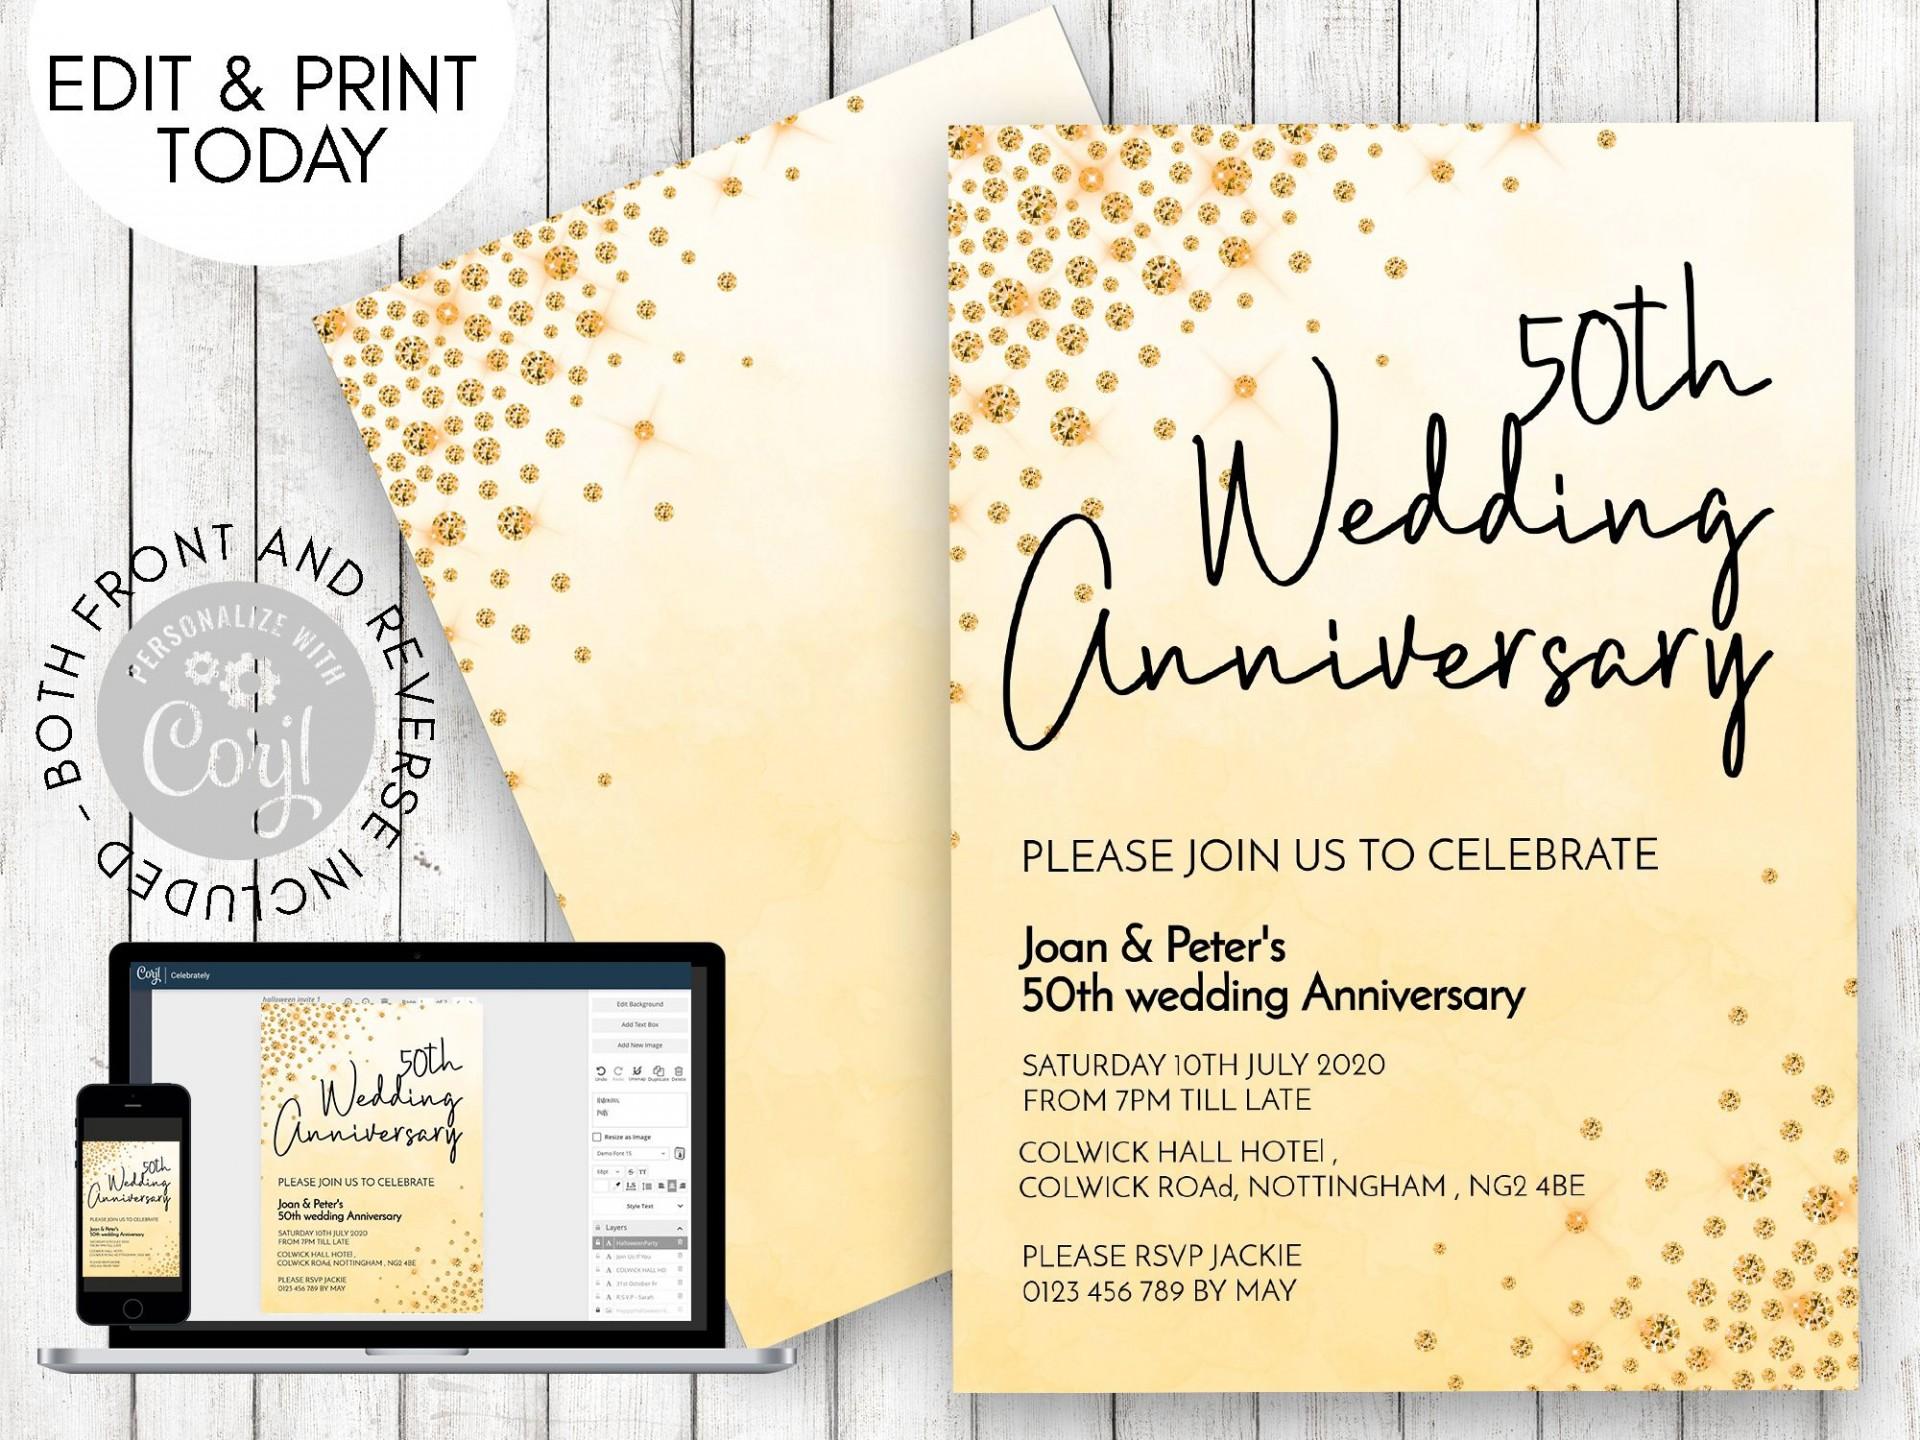 003 Wondrou Free Printable 50th Wedding Anniversary Invitation Template Photo 1920